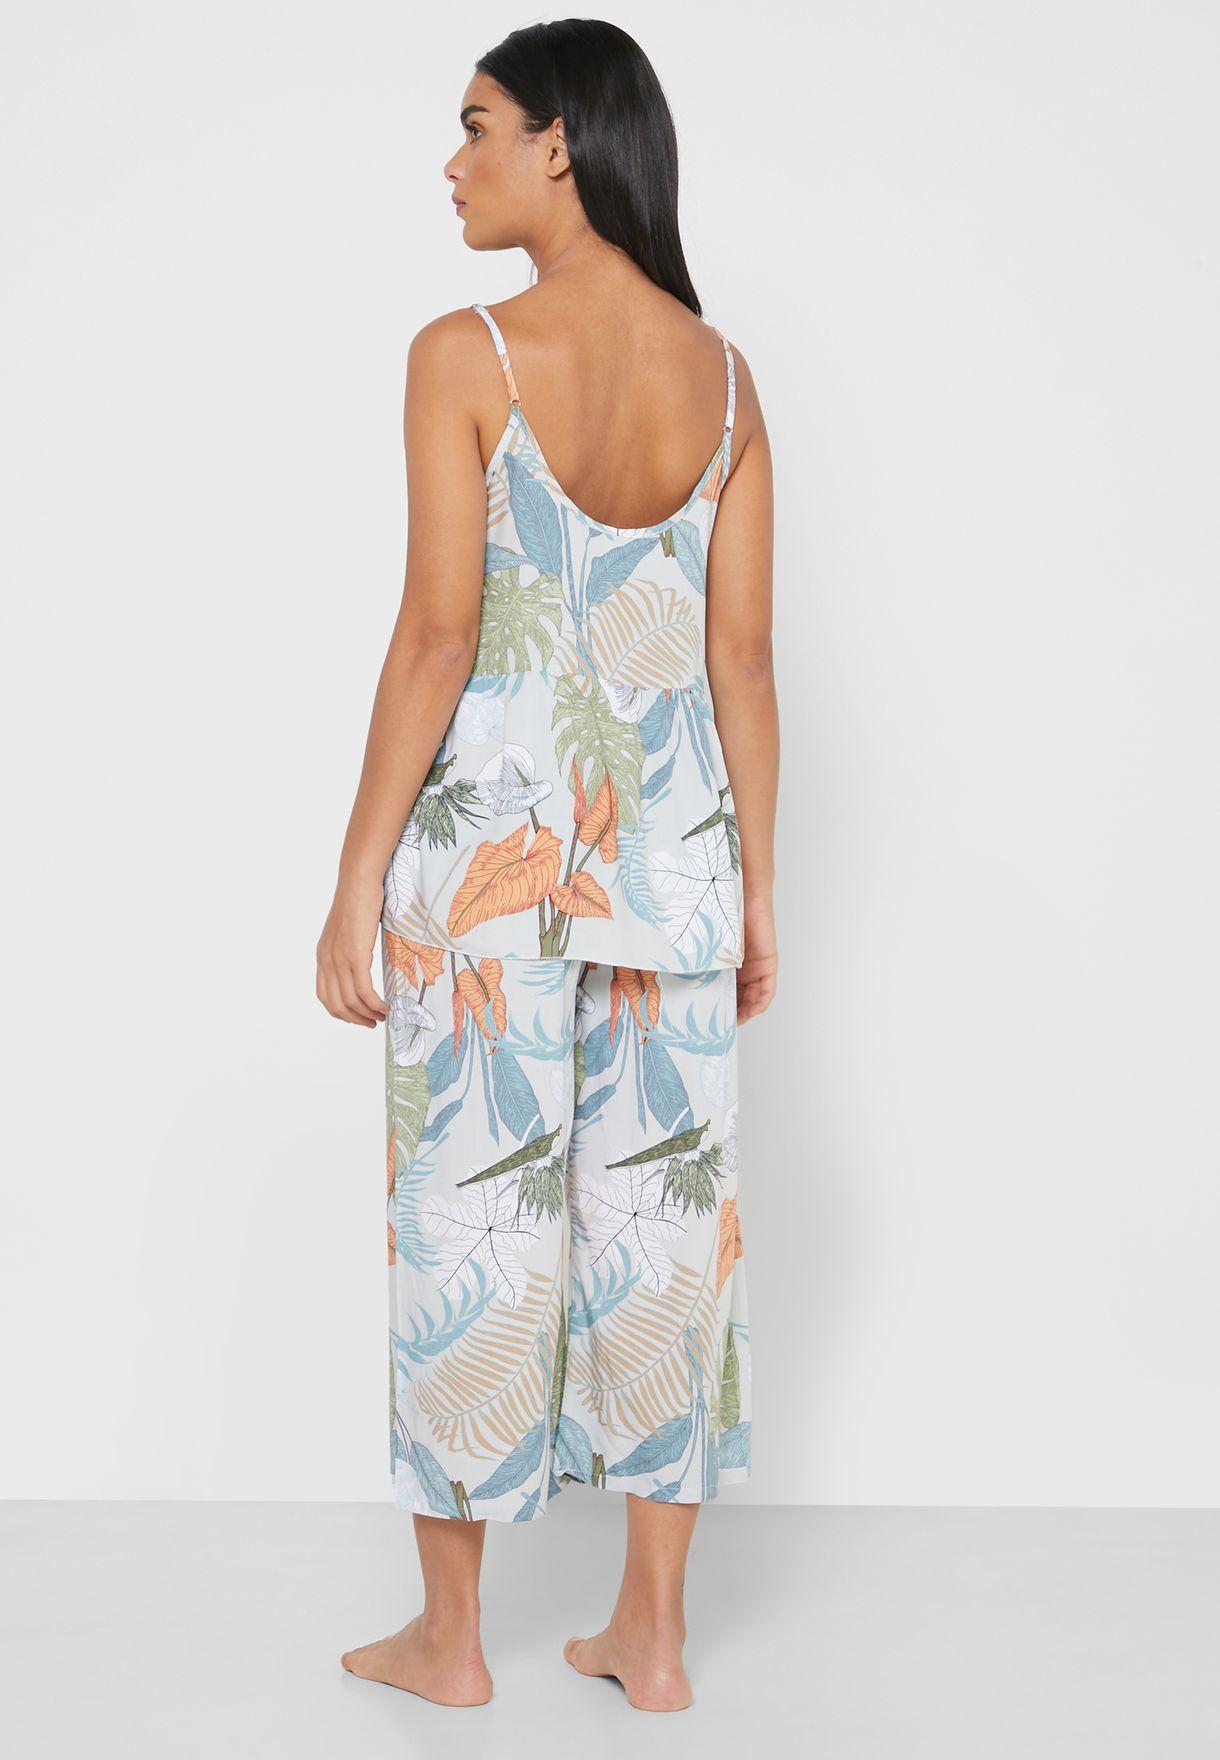 3 Pcs Floral Print  Nightwear Set